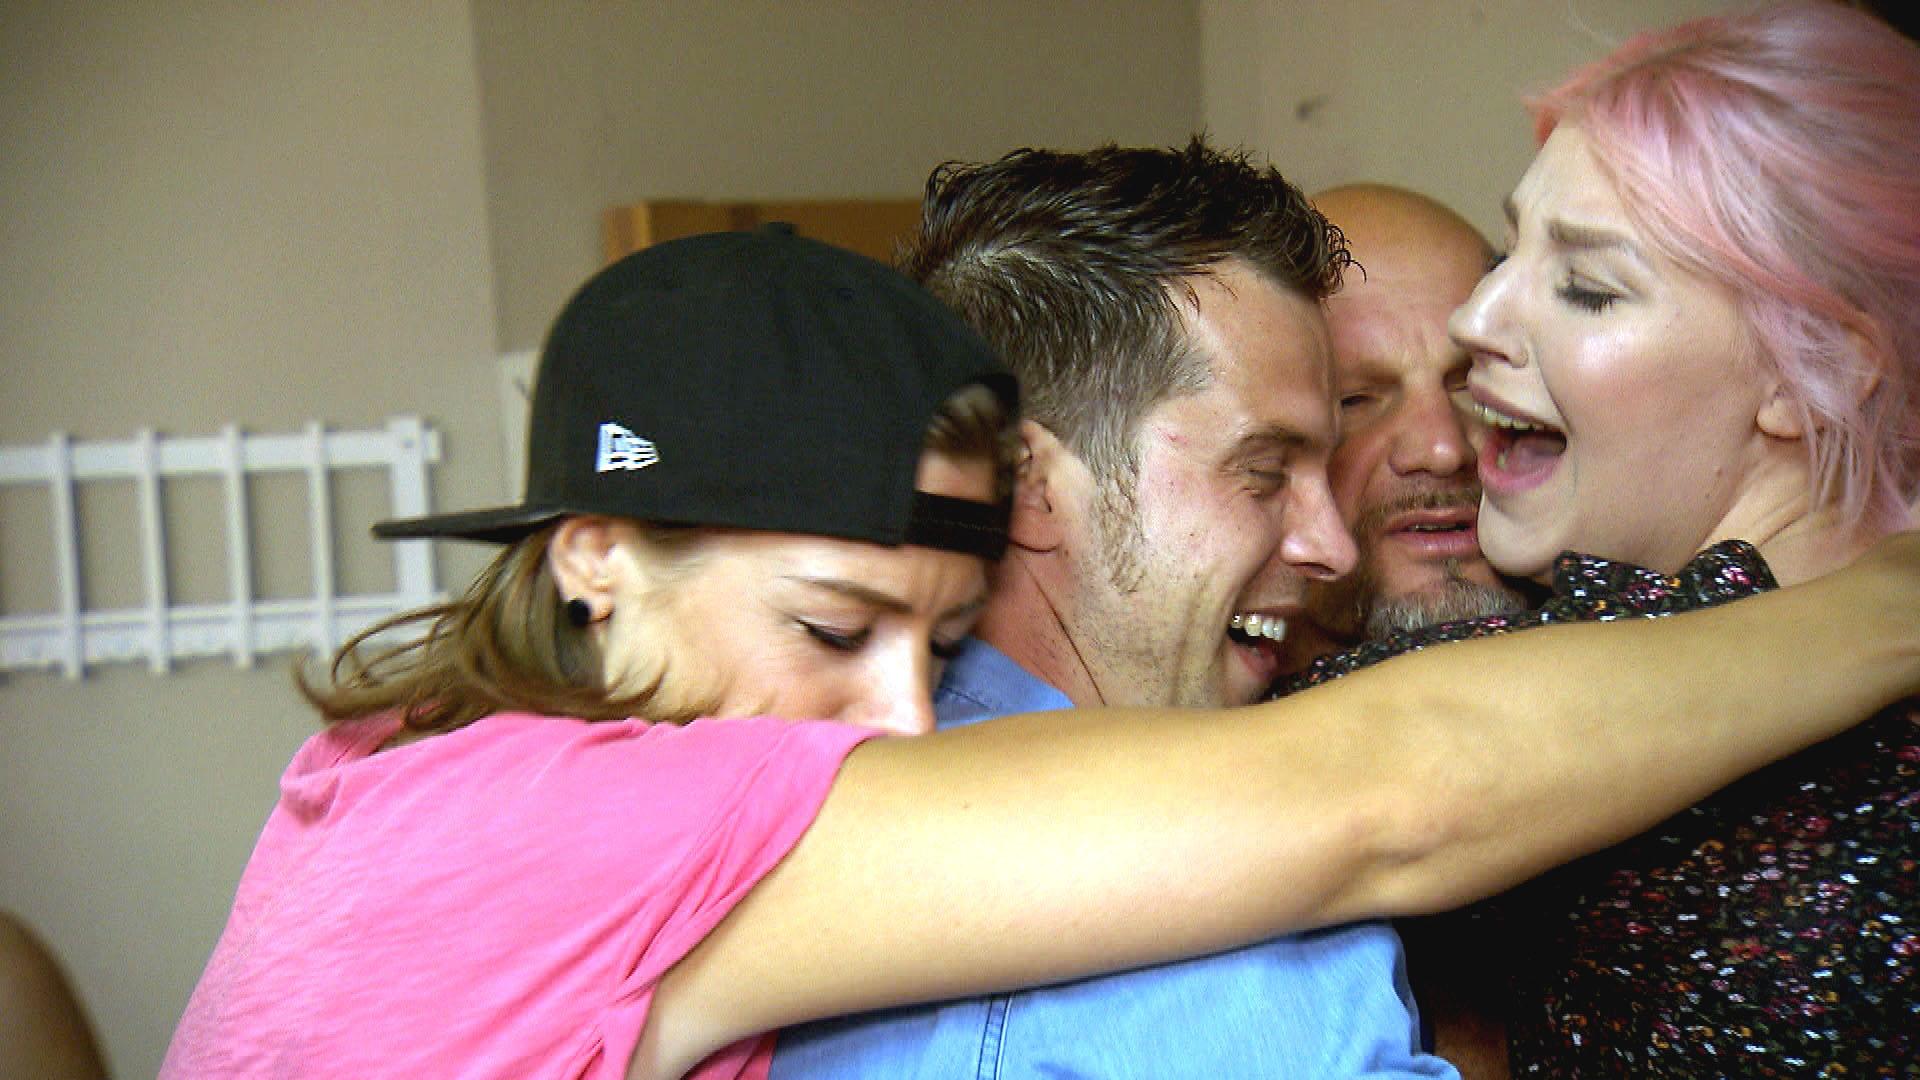 v.l.n.r.: Alina, Basti, Joe, Paula (Quelle: RTL 2)